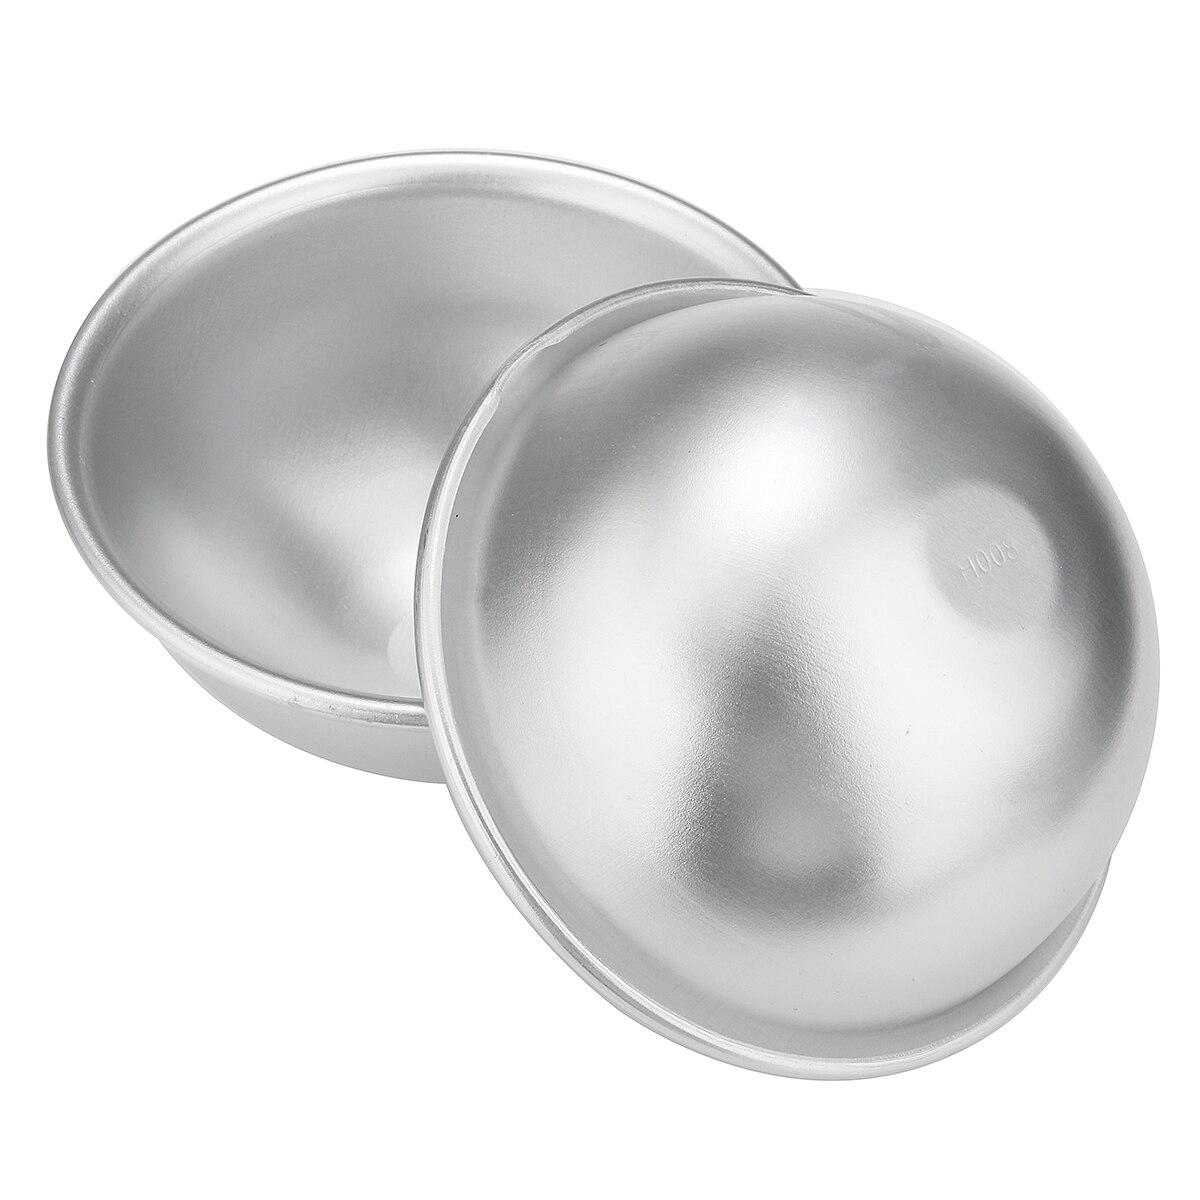 2/4/6pcs 3D 8cm Bath Bomb Mold Metal Aluminum Alloy Ball Sphere Shape Bath Salt Bomb Handmade DIY Bathing Salt Making Tools